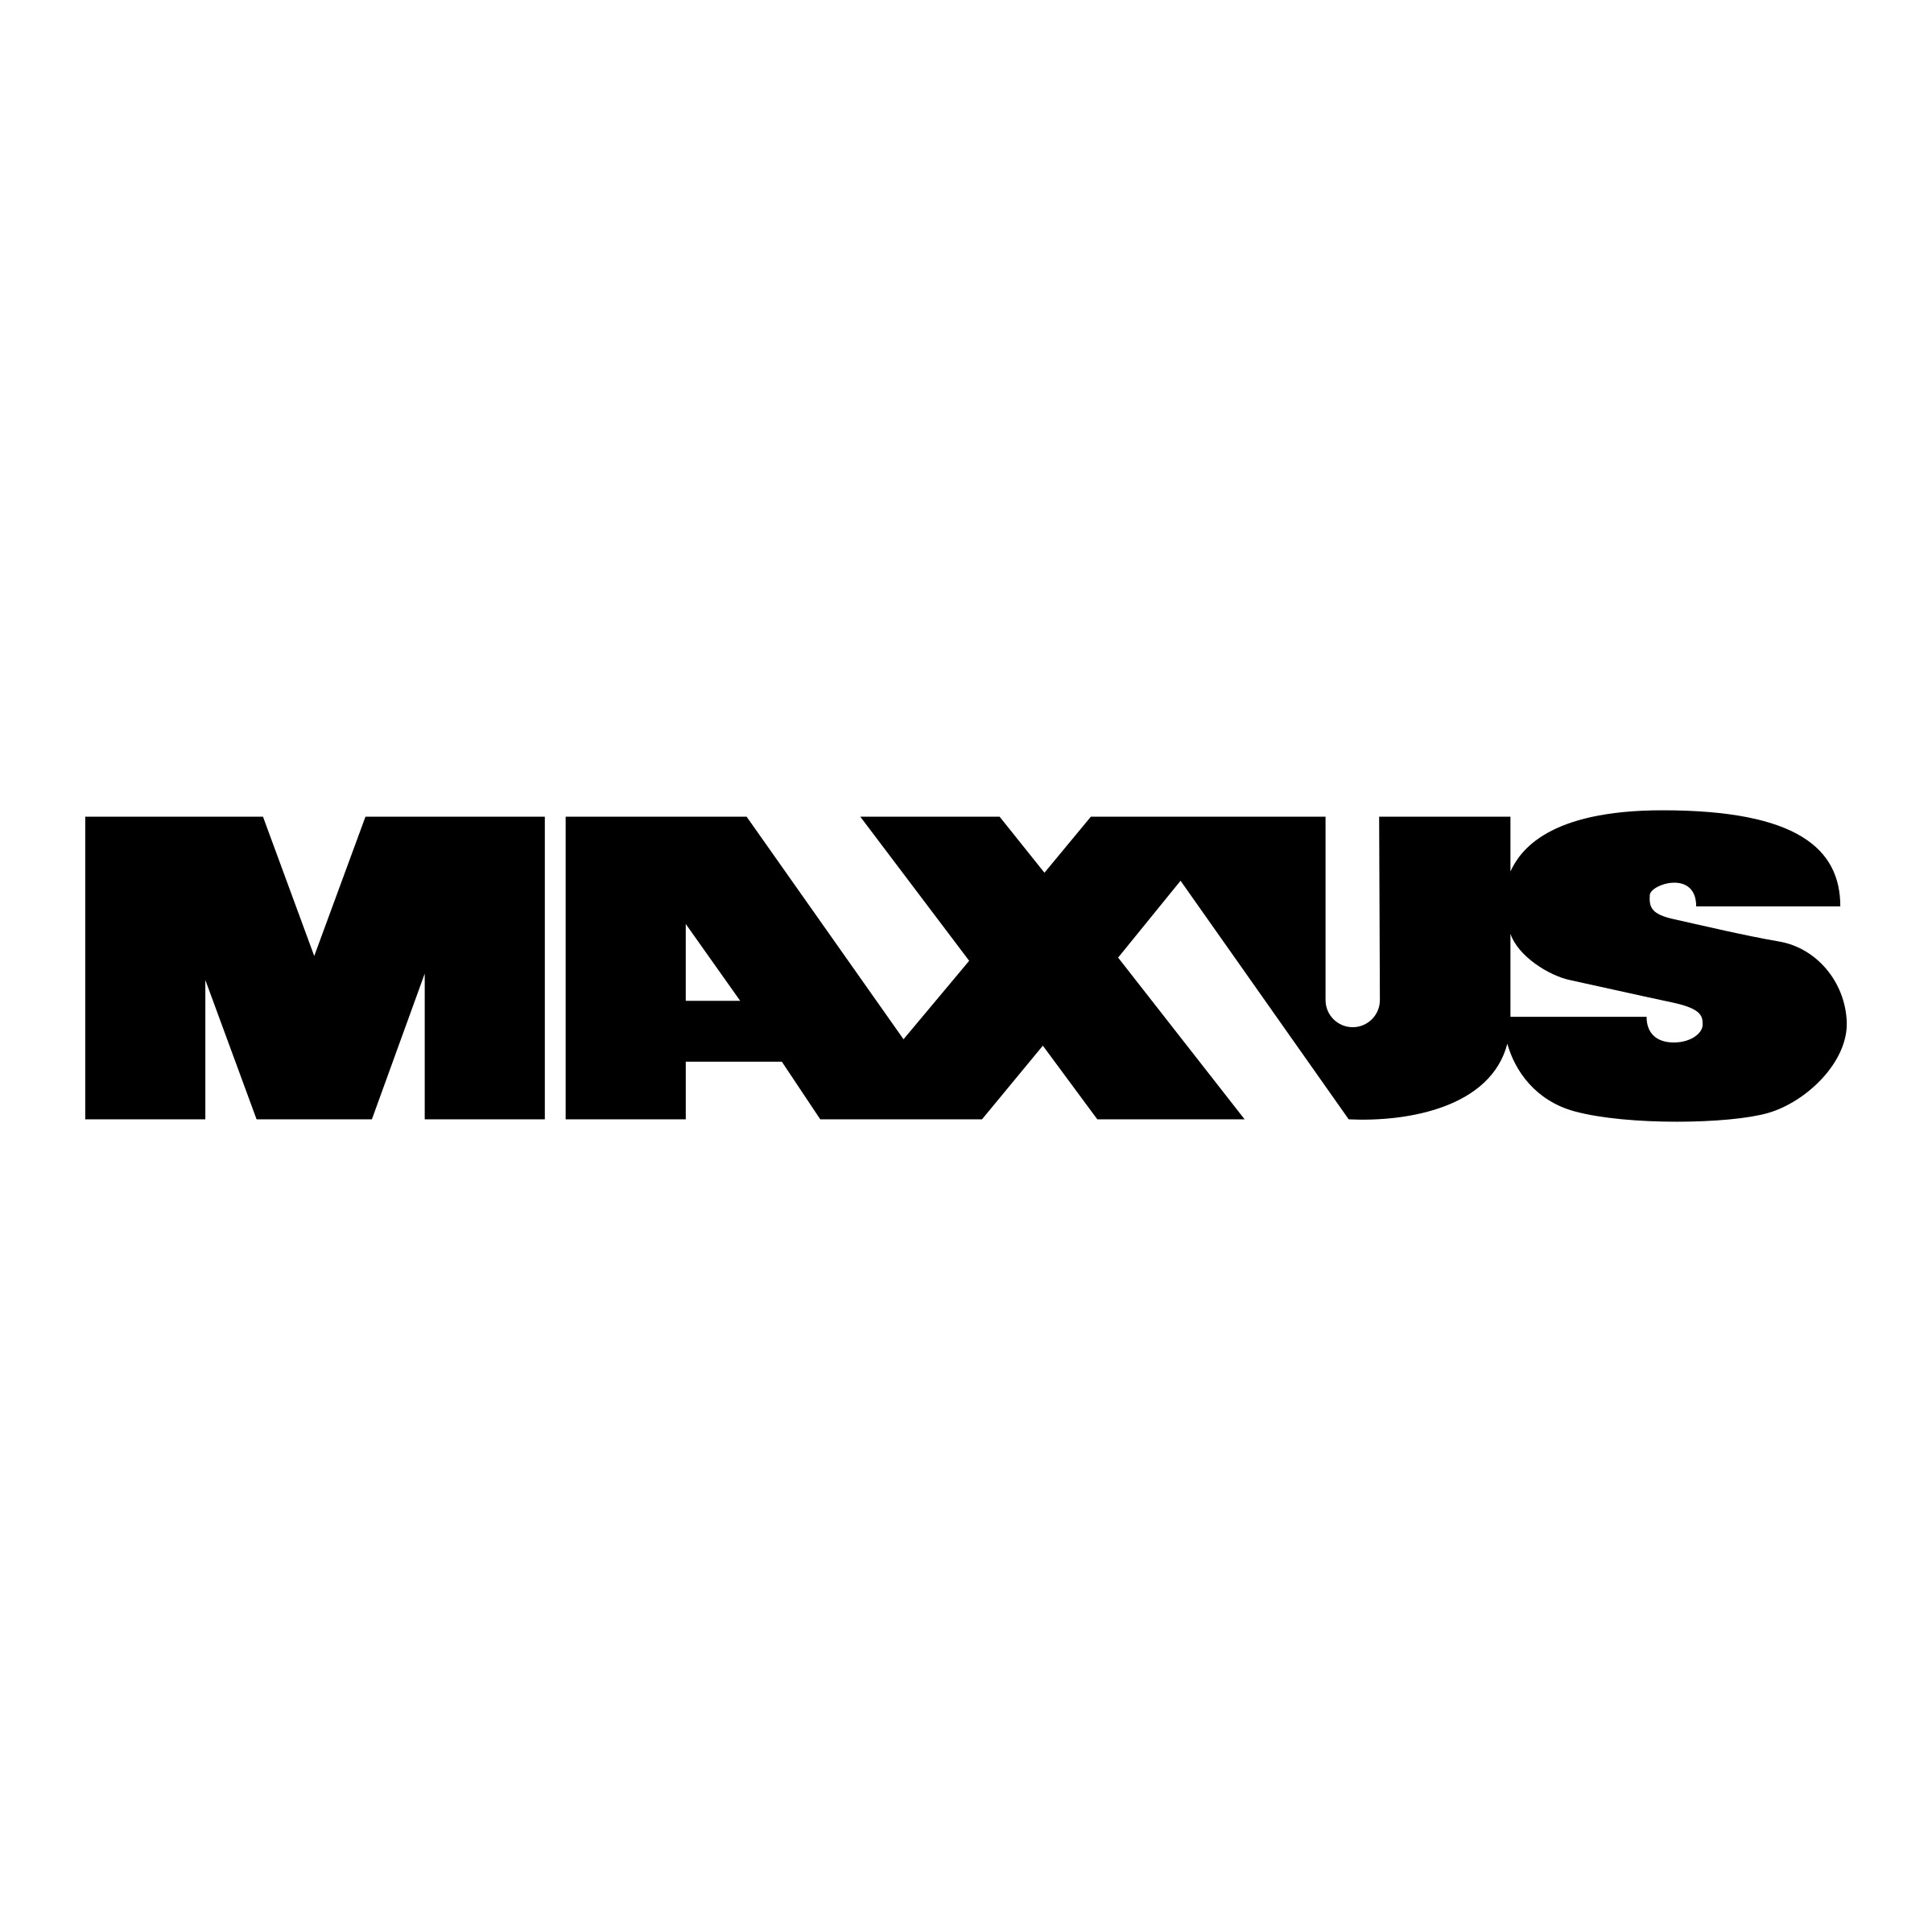 Maxus logo clipart image transparent download Maxus Logo PNG Transparent & SVG Vector - Freebie Supply image transparent download